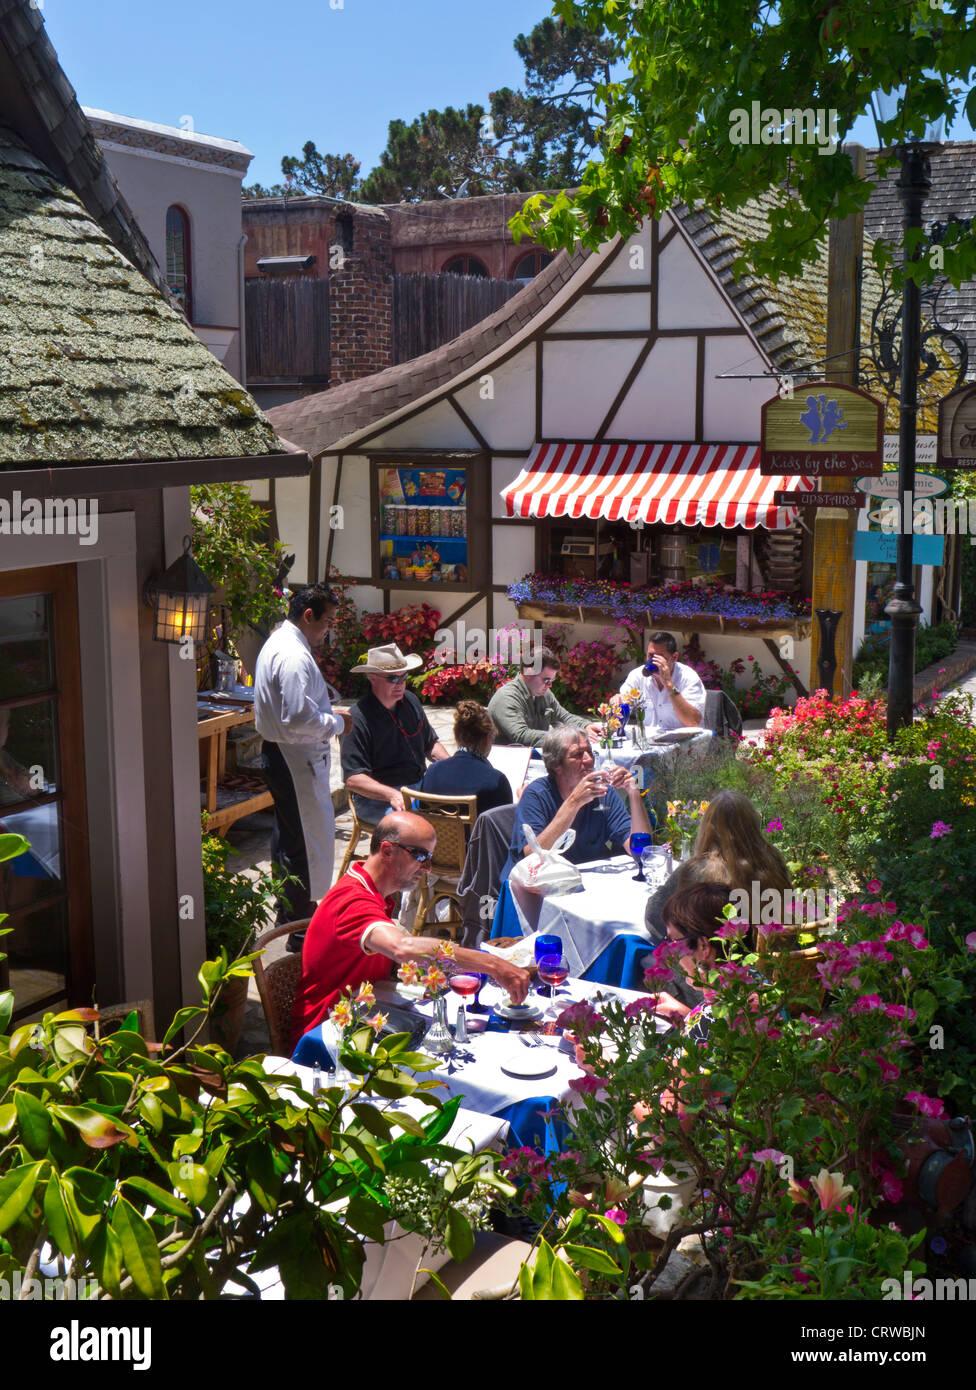 Portabella Restaurant Alfresco Terrace Dining In Carmel By